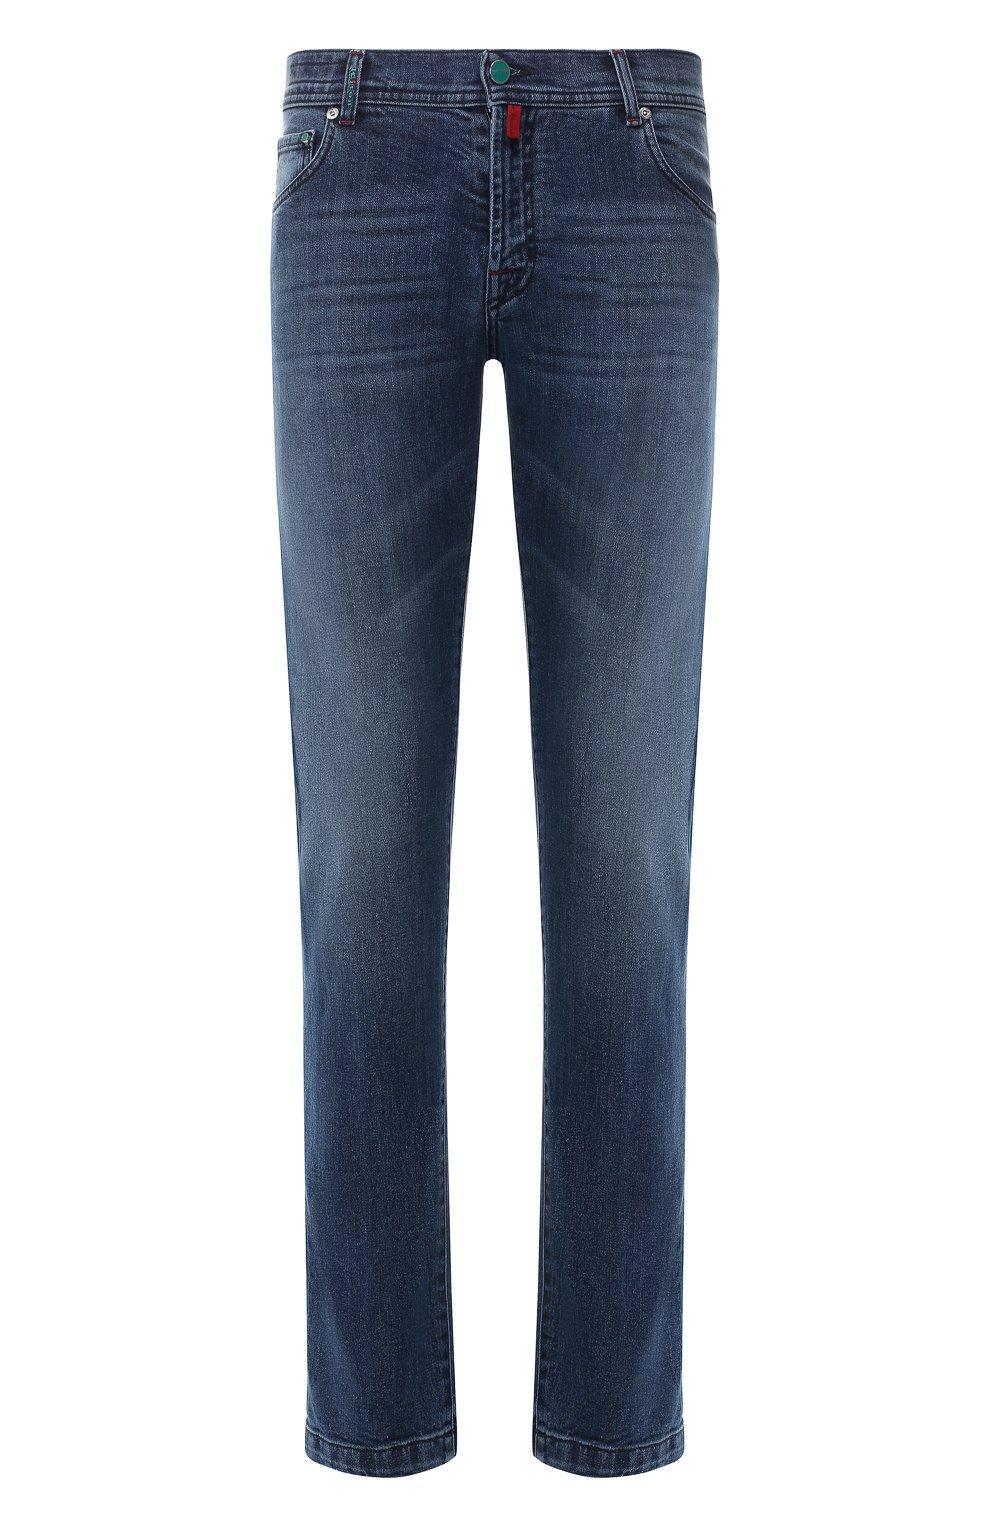 Мужские джинсы прямого кроя KITON синего цвета, арт. UPNJS/J07R52 | Фото 1